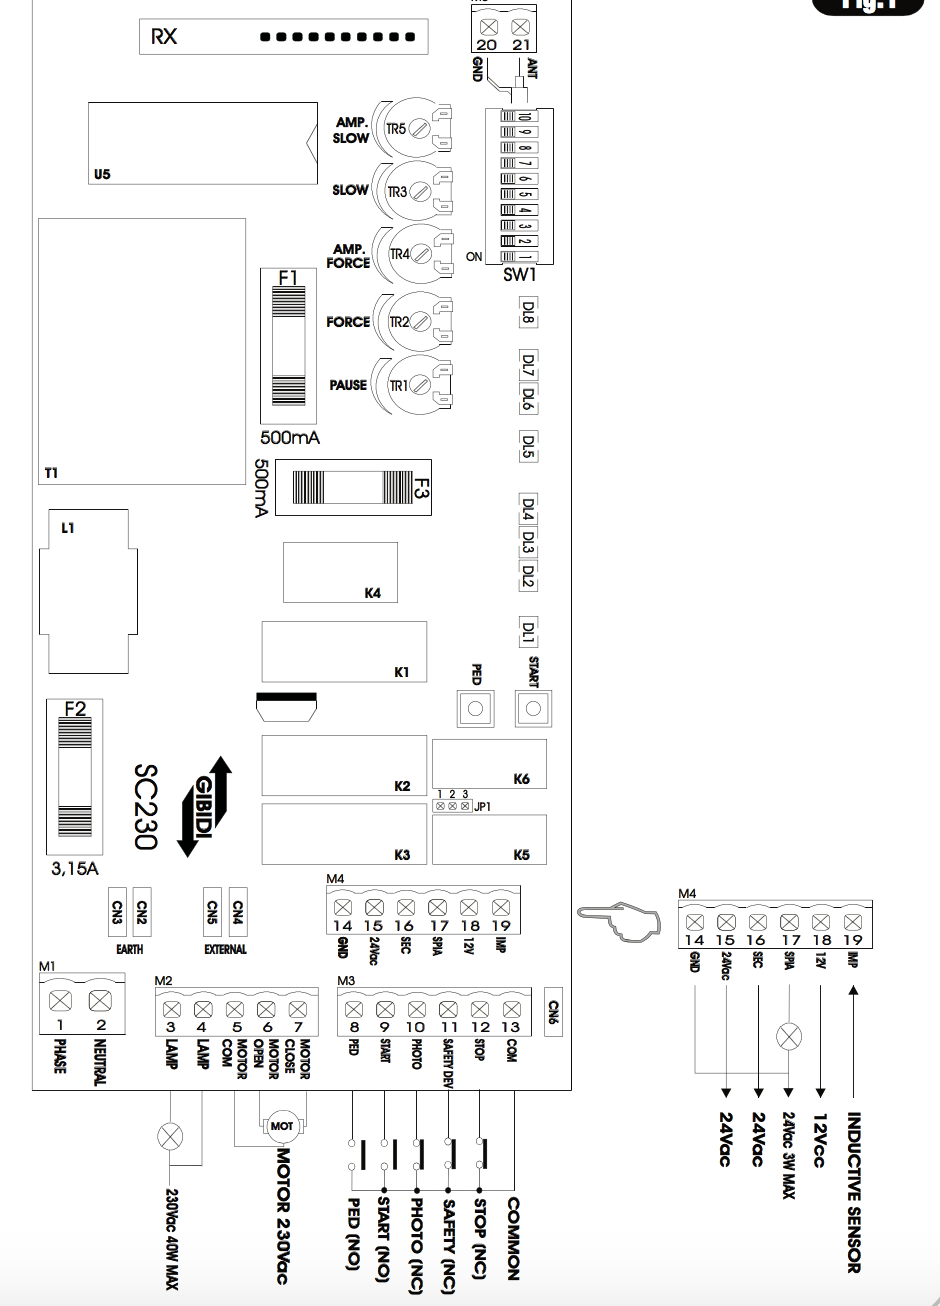 GIBIDI SC230 CONTROL PANEL